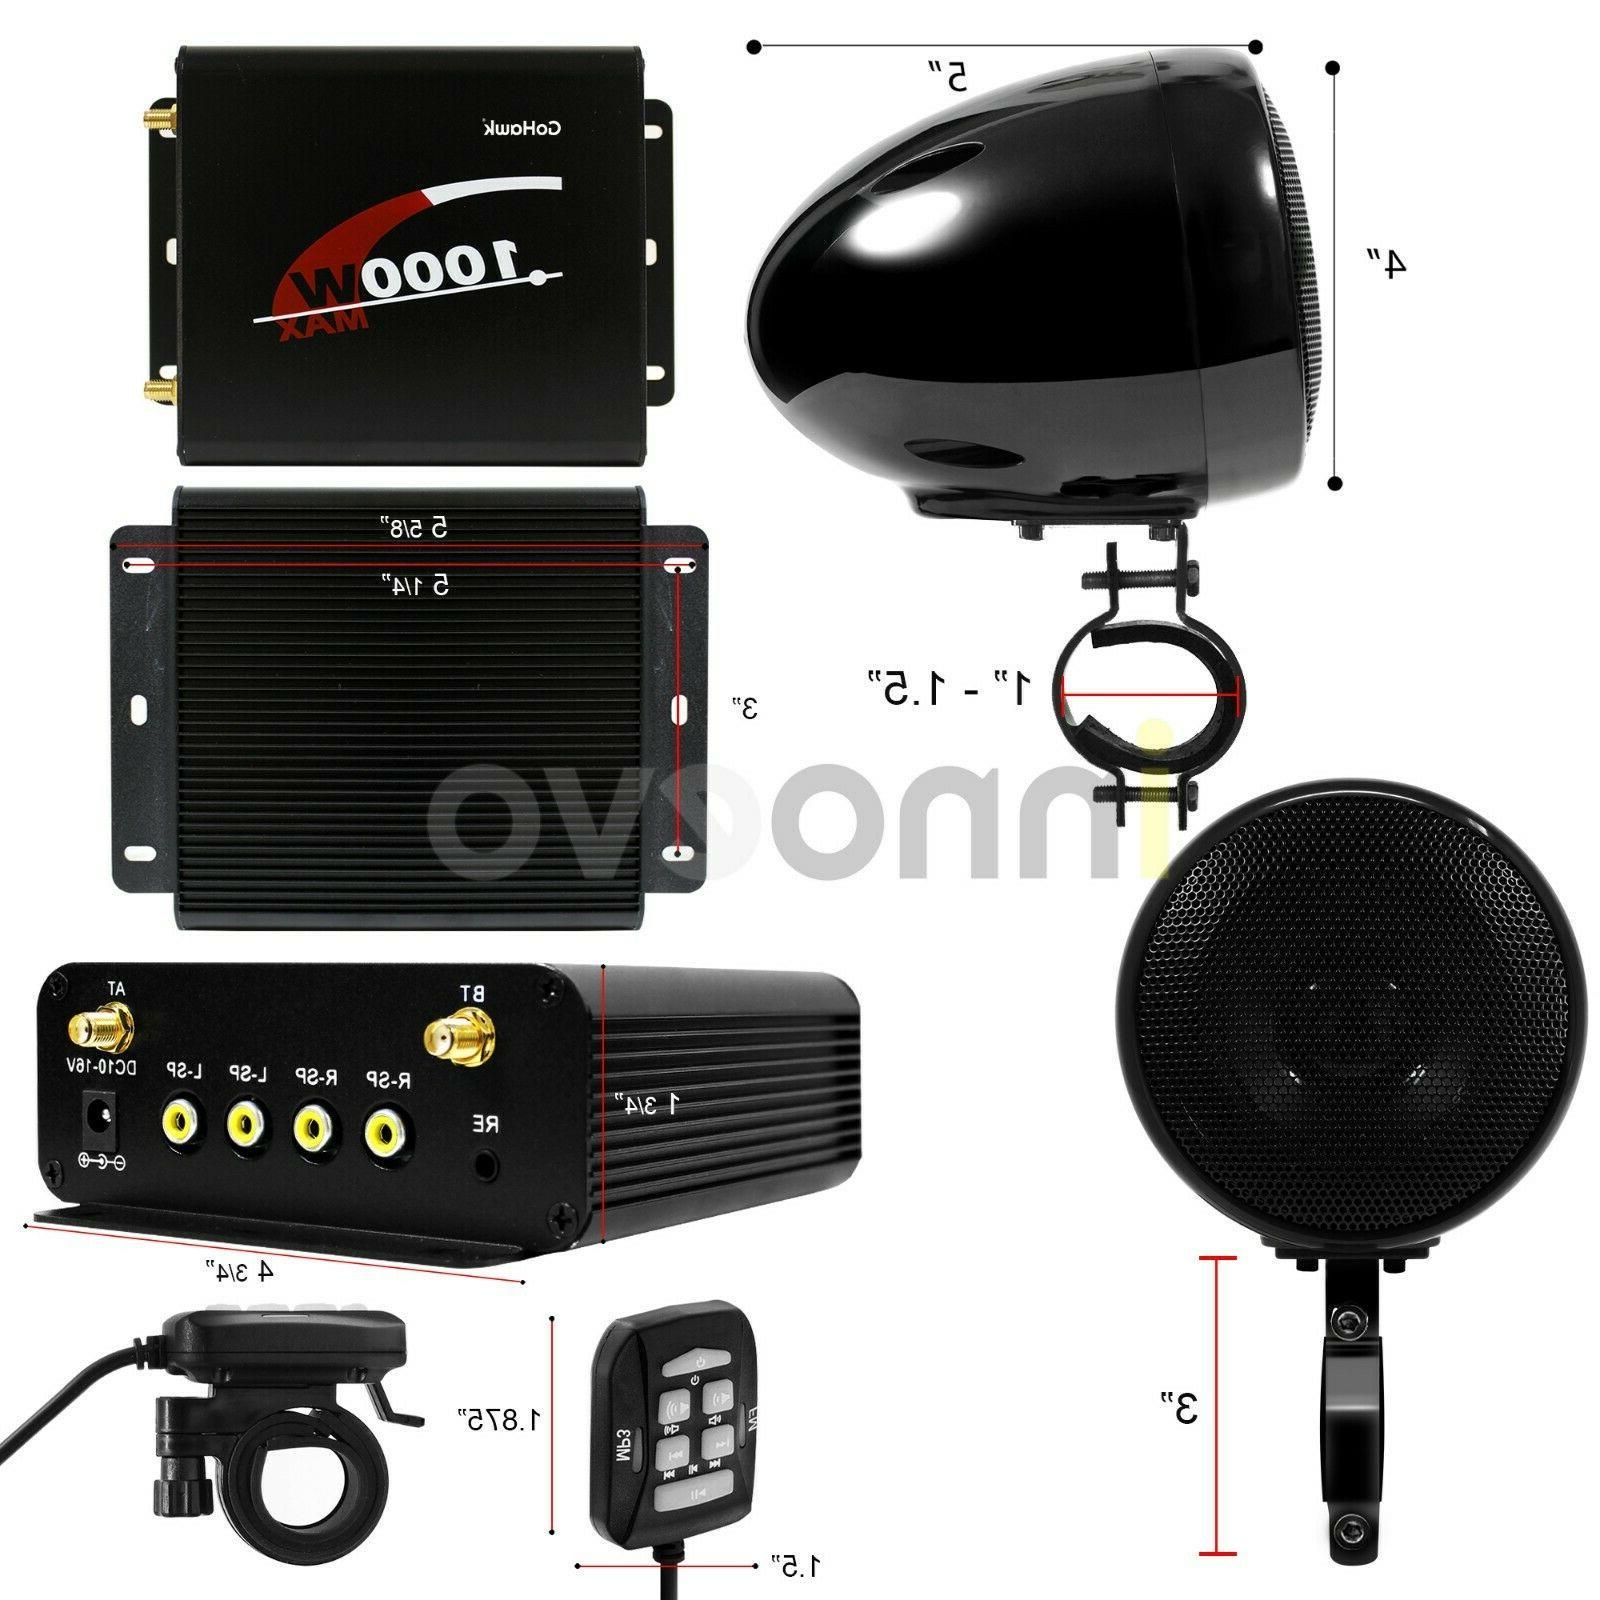 1000W Amp Waterproof ATV UTV Stereo Speakers Audio